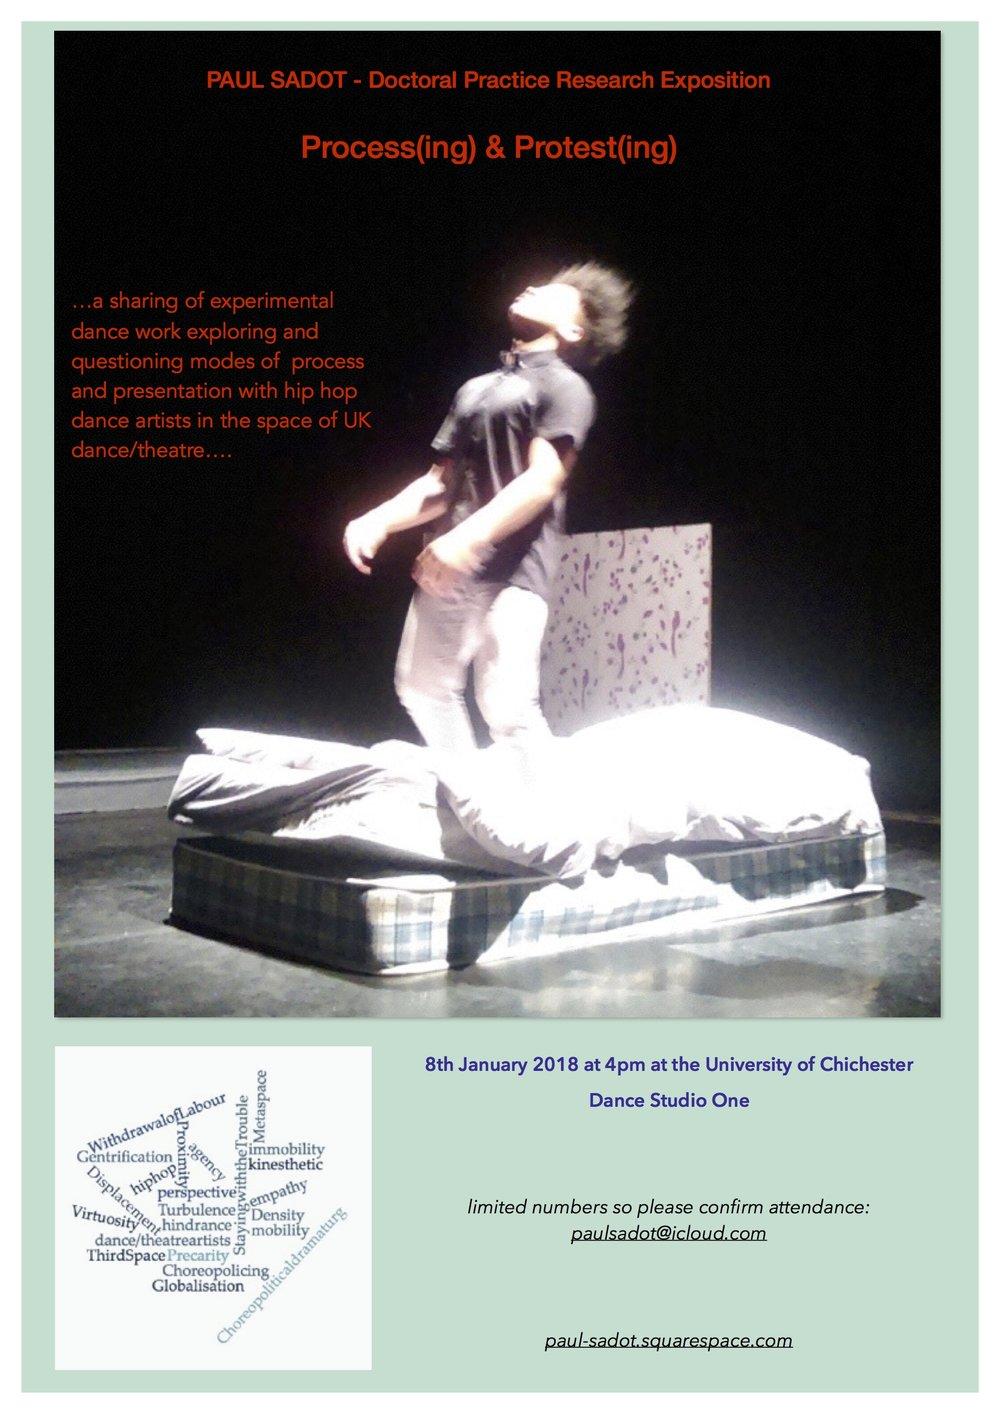 Paul Sadot Final Exposition Poster.jpg